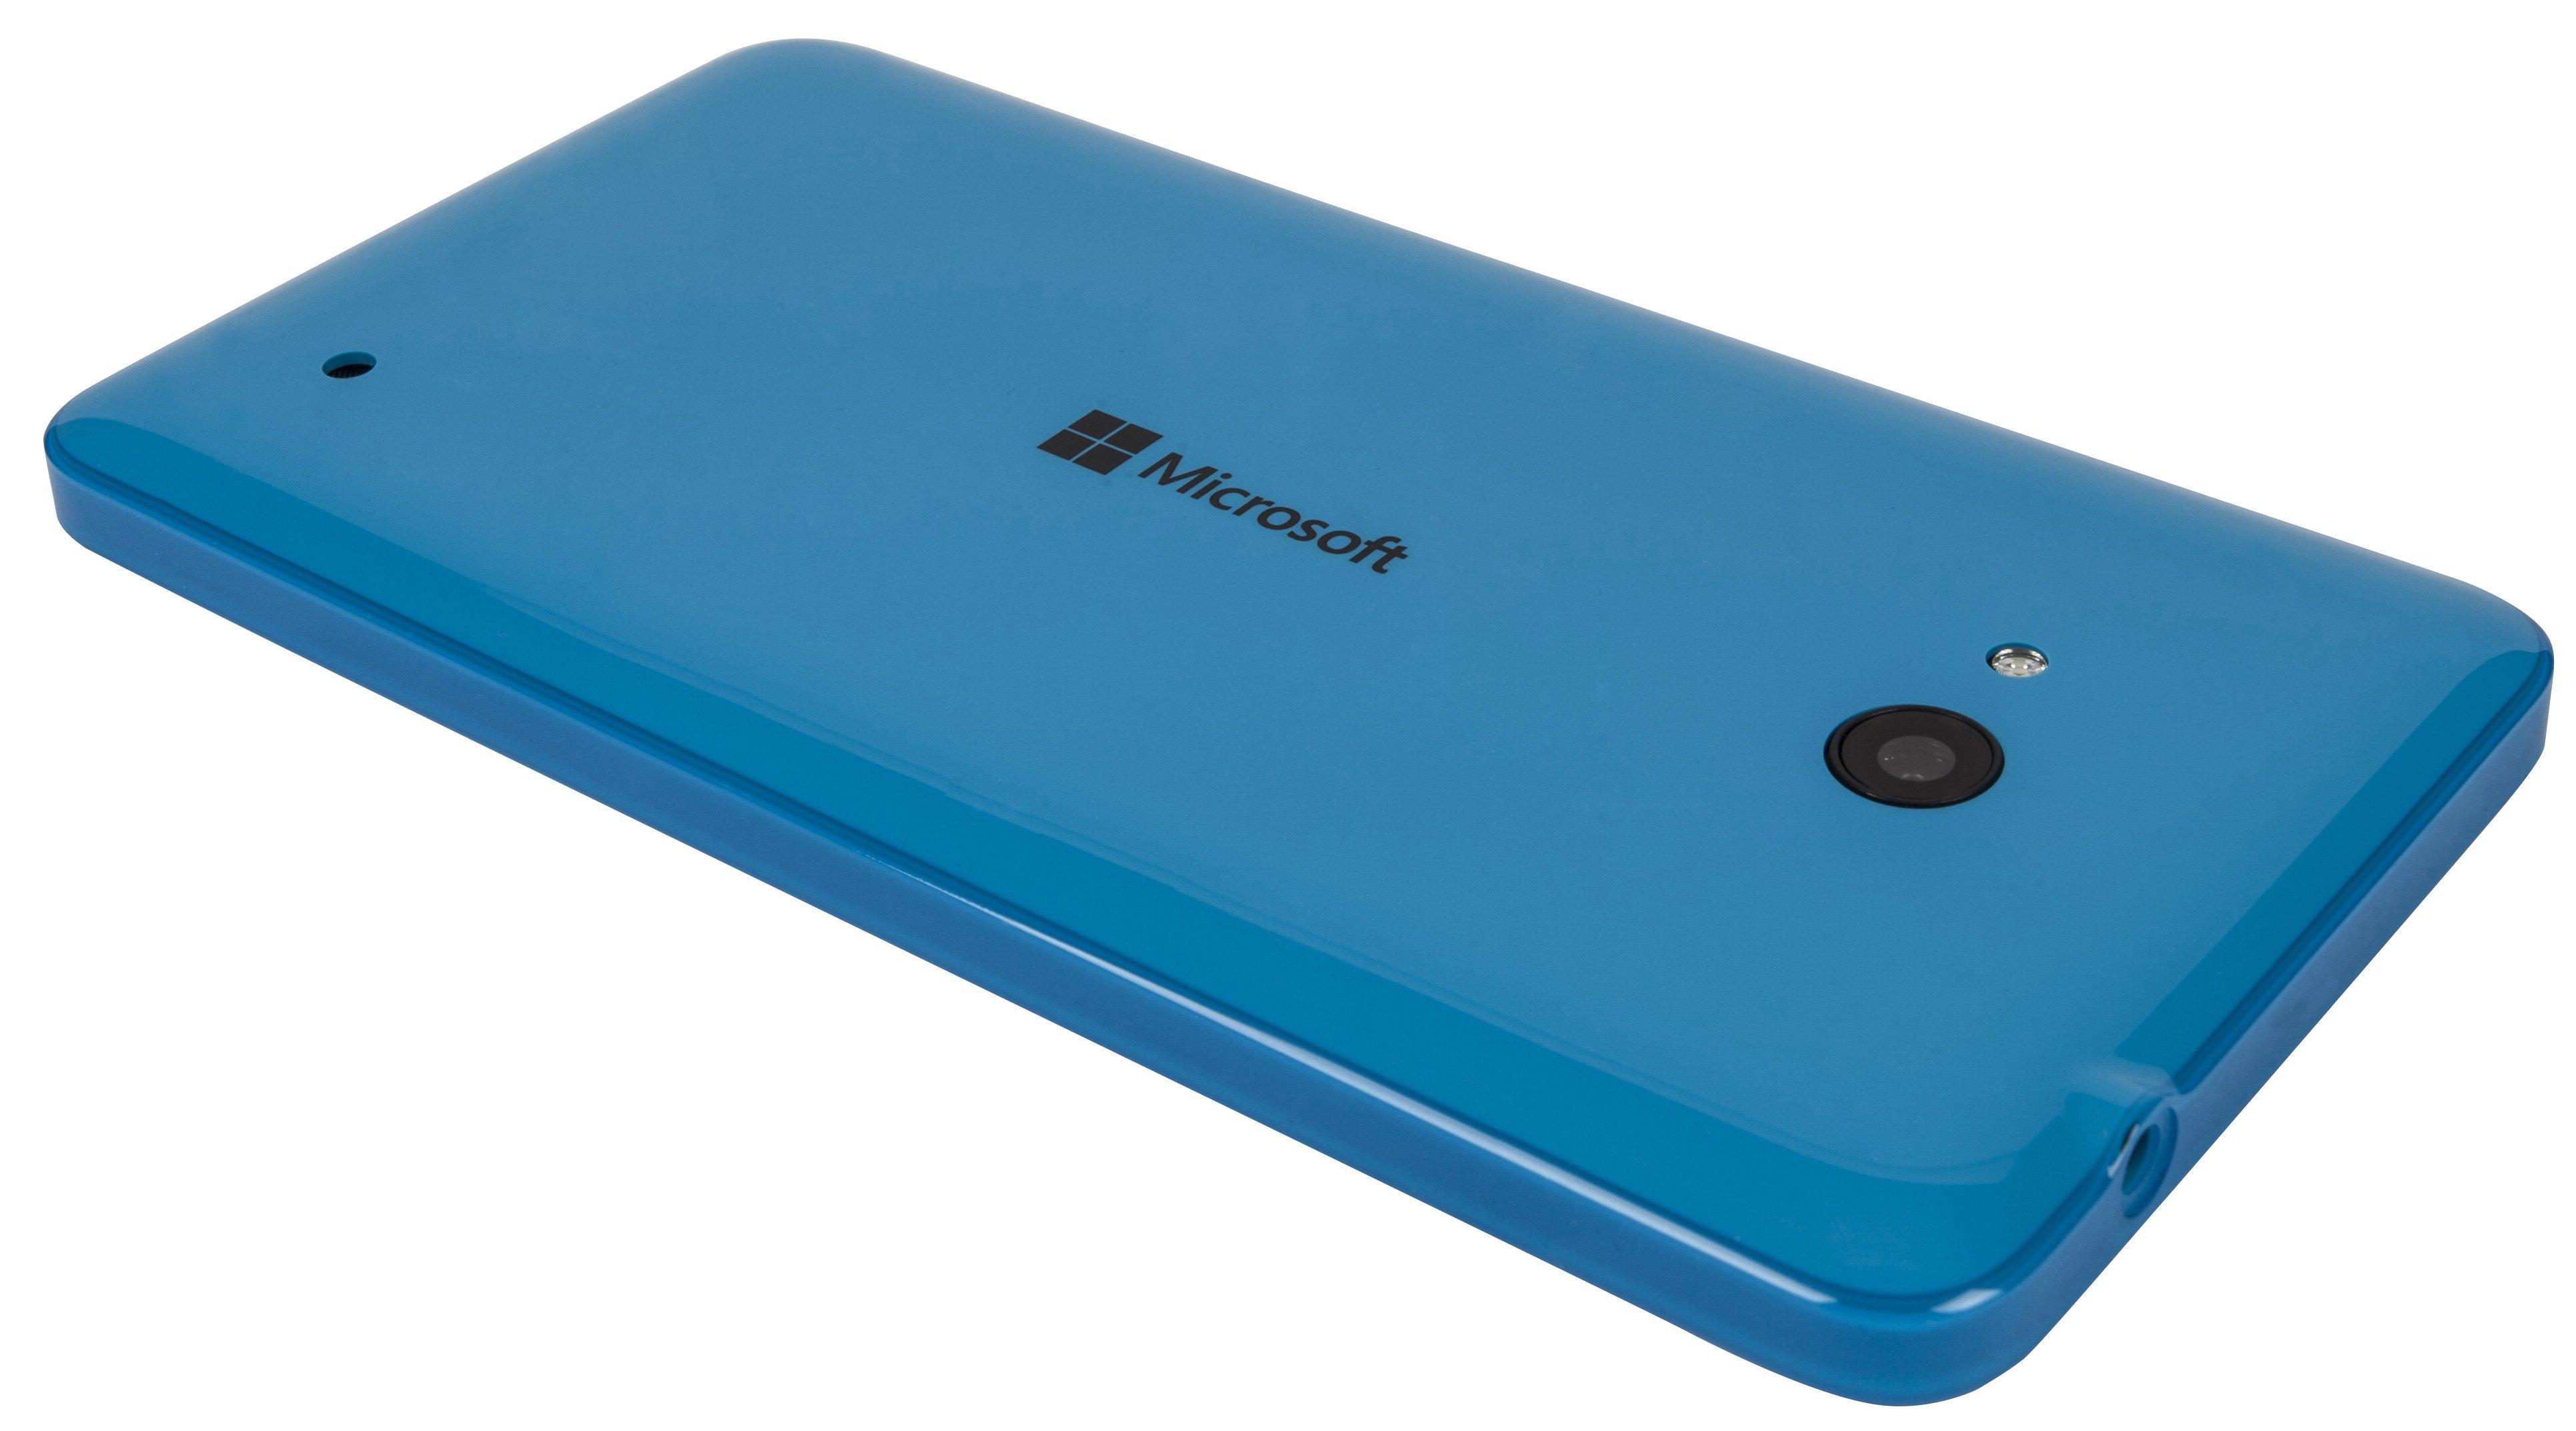 Microsoft lumia 535 dual sim white quad core 1 2ghz unlocked cell - Microsoft Lumia 640 Rear